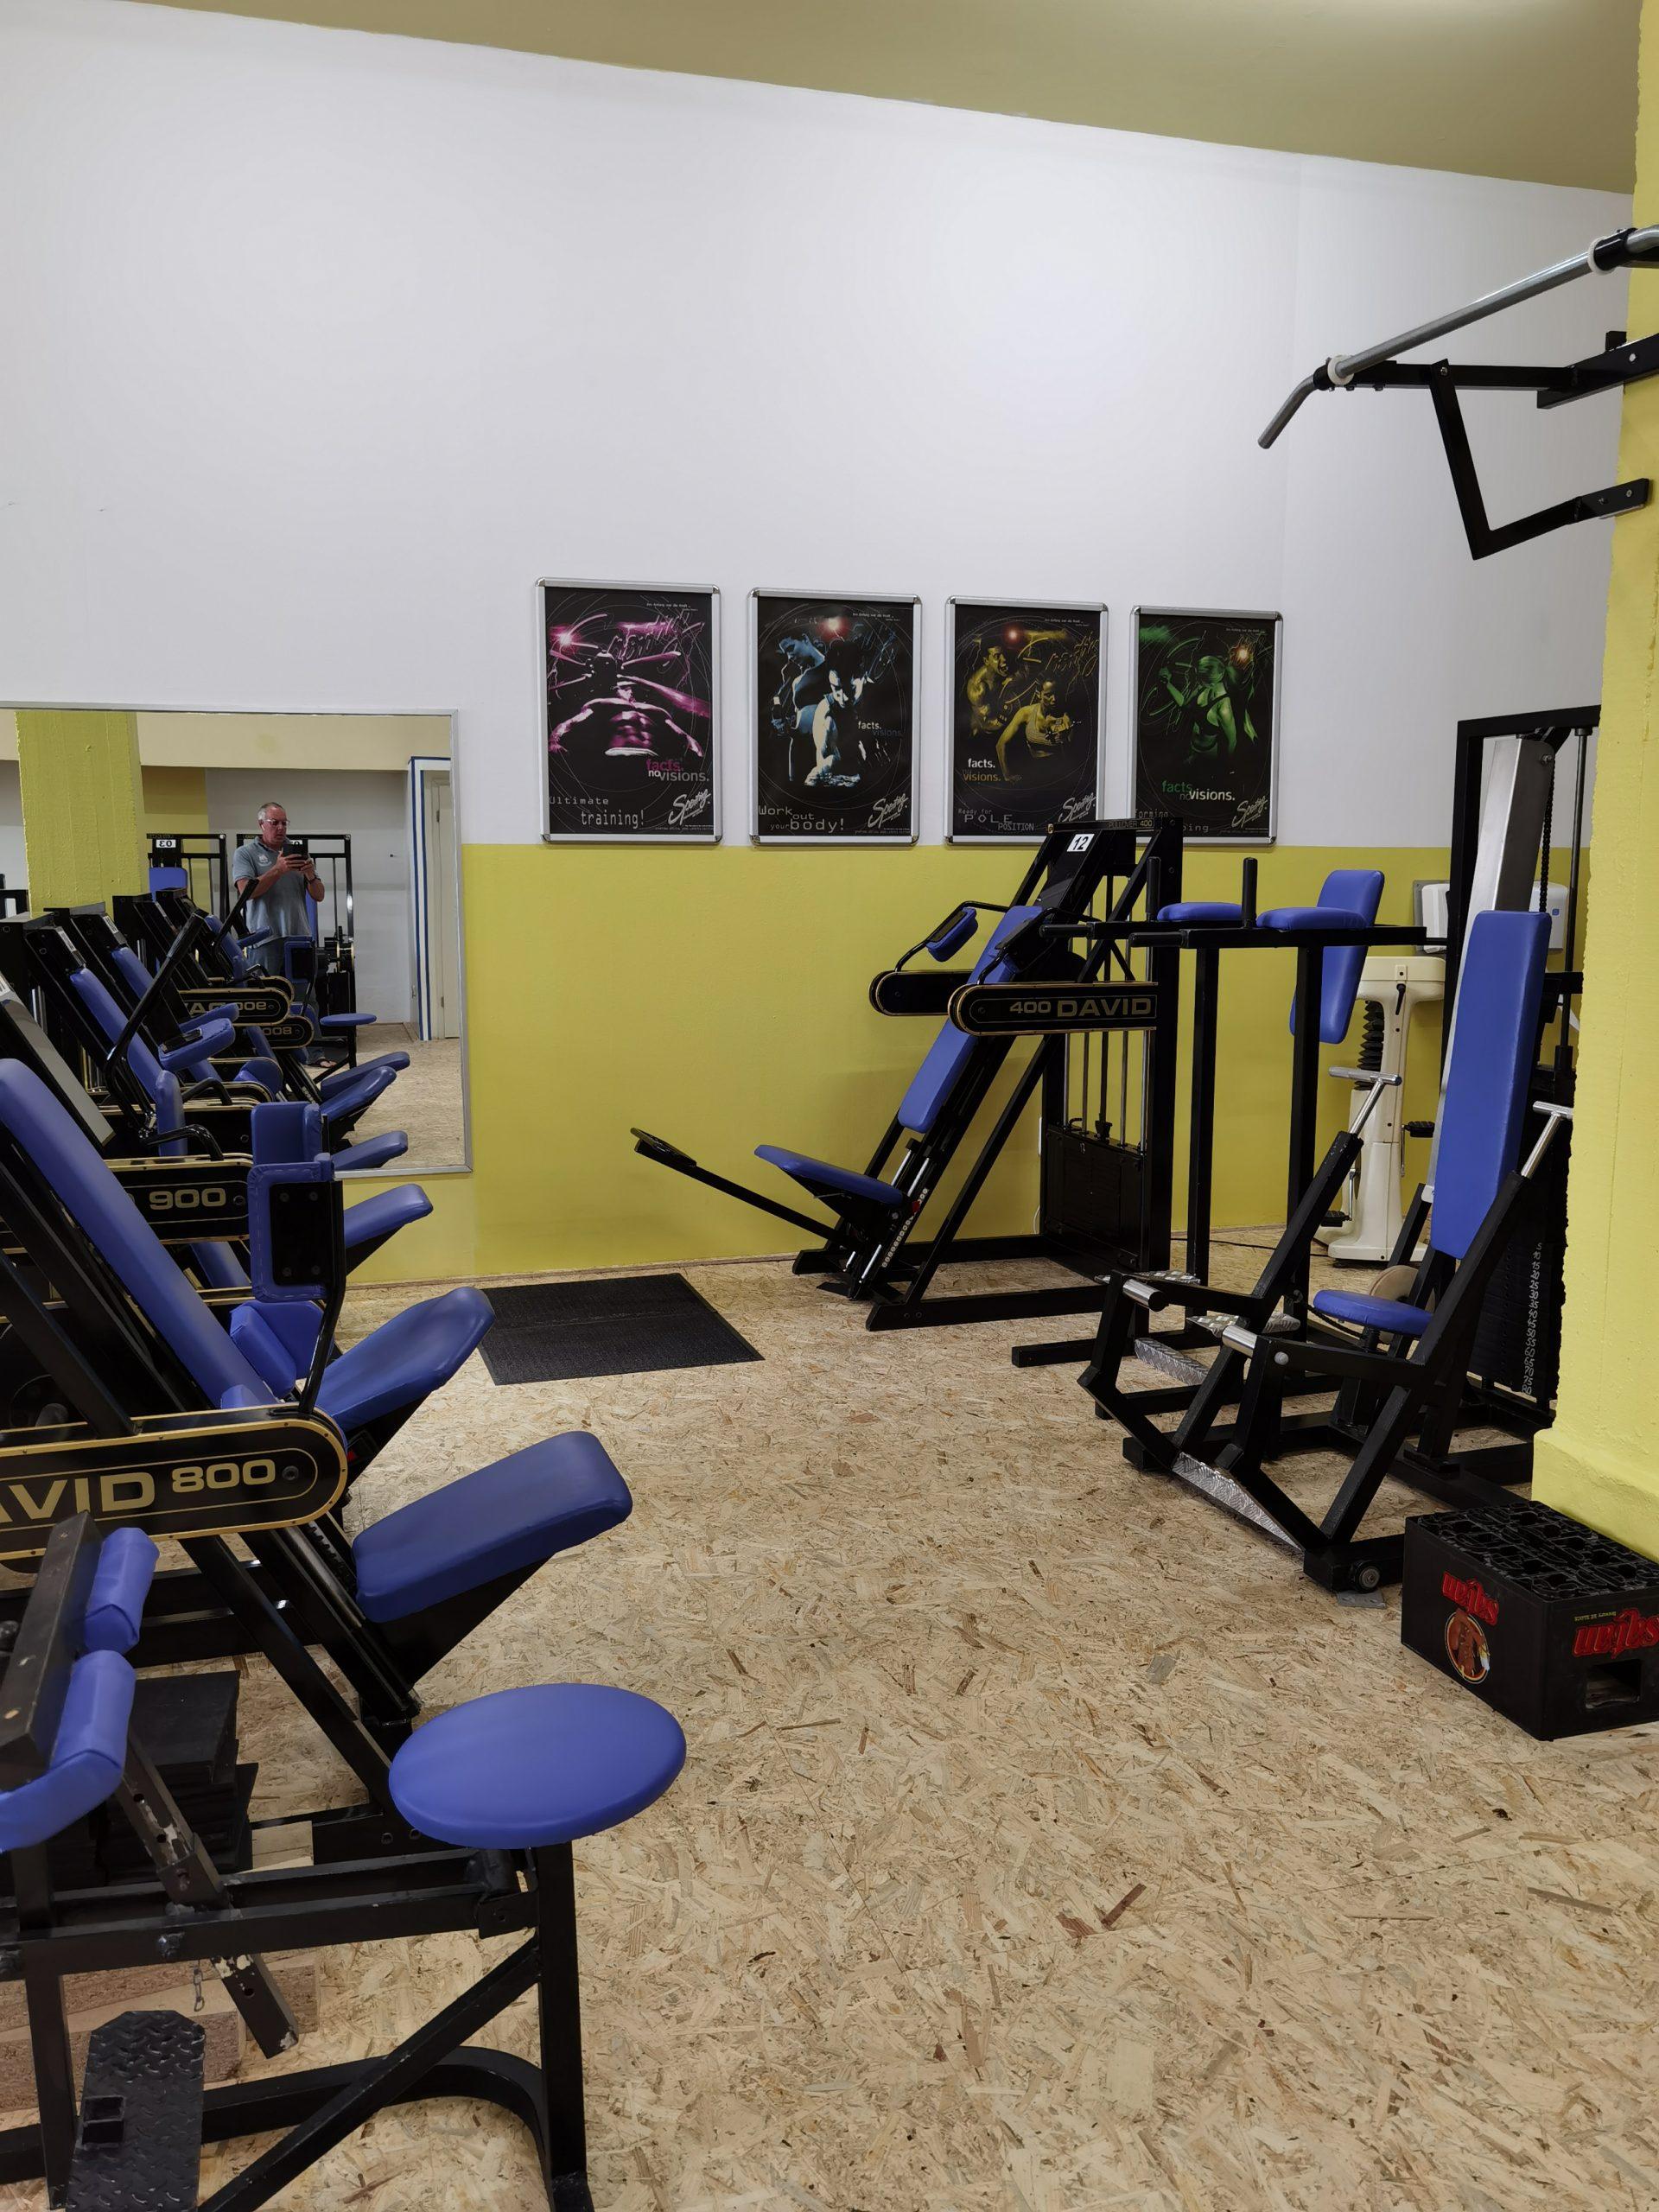 Sportstudio Johannisthal Berlin Fitness Studio Center